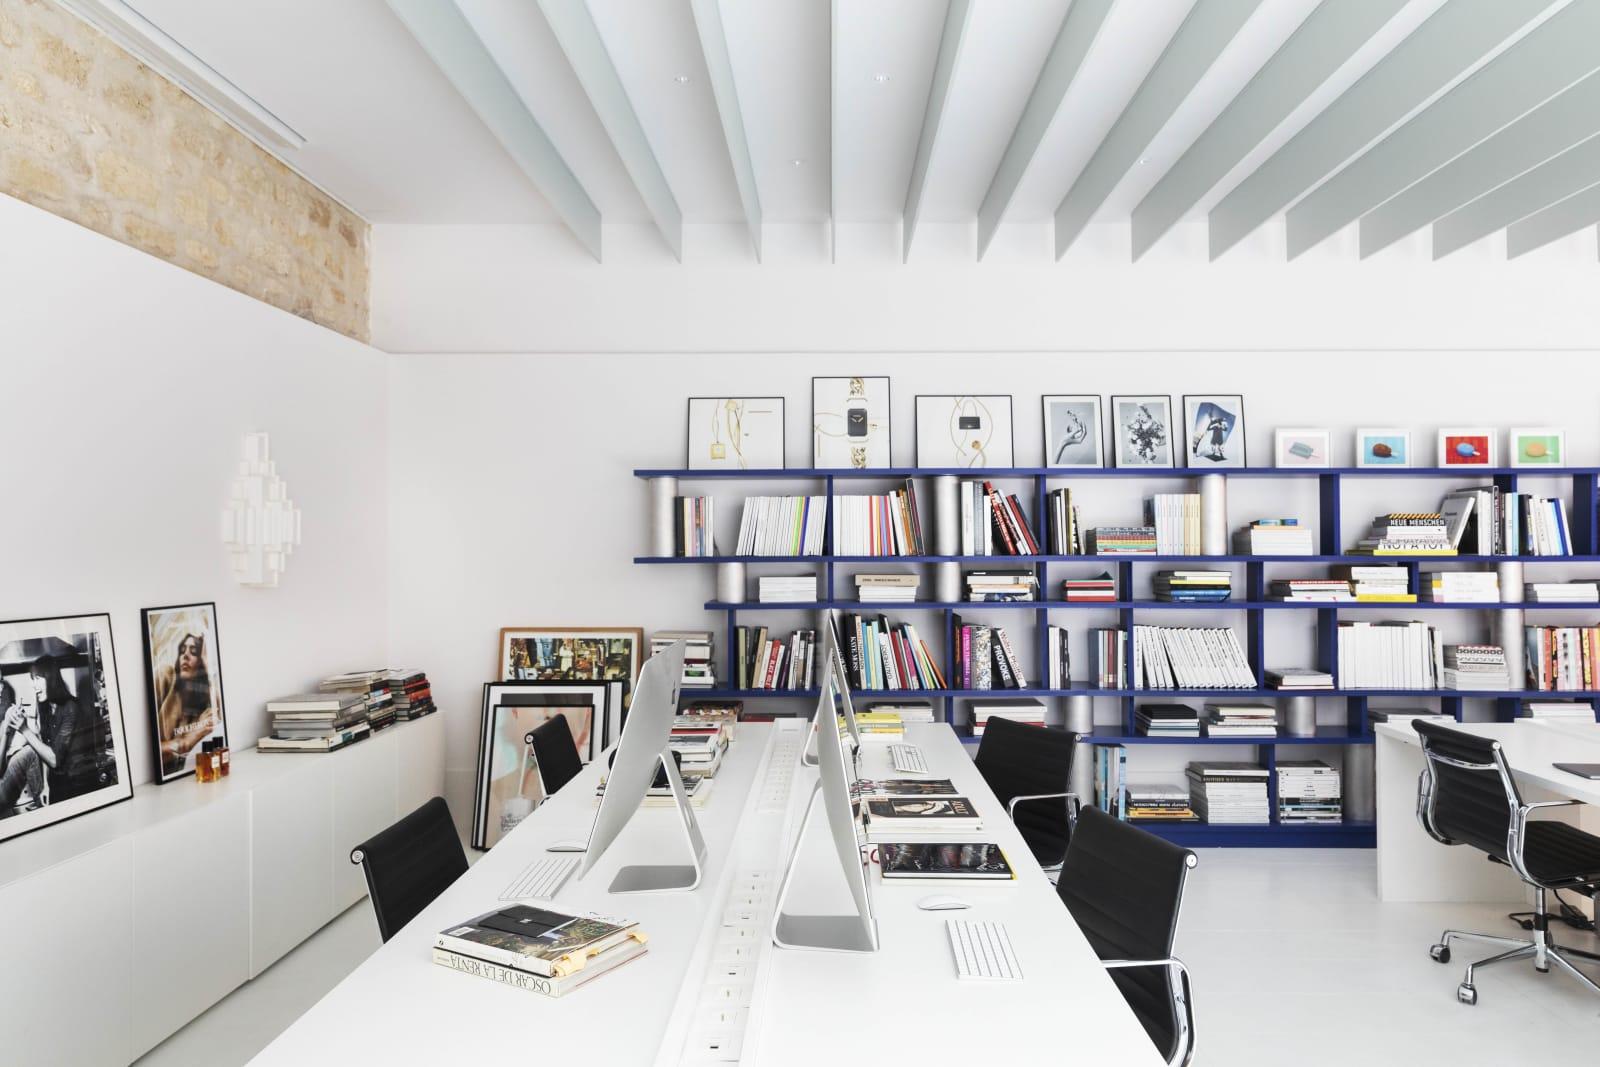 Büro von Al Dente in Paris